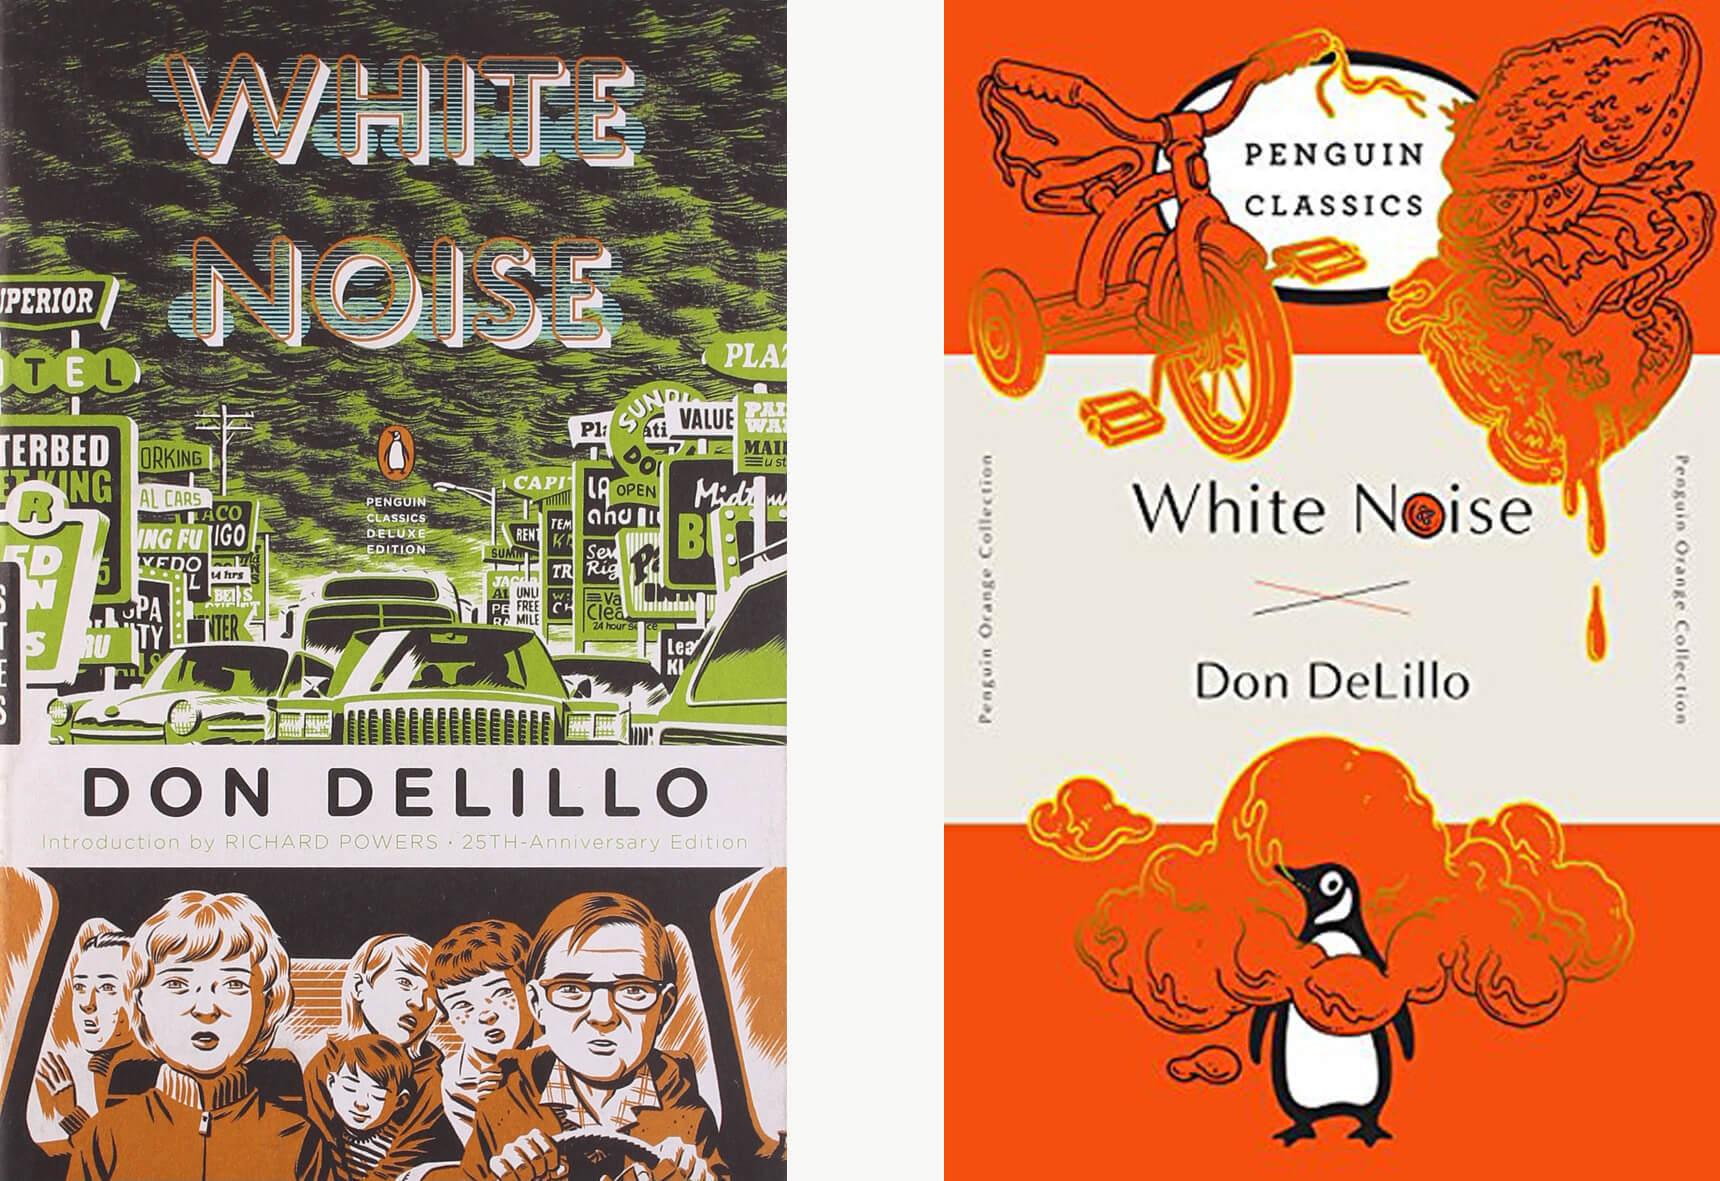 DonDelillo-WhiteNoise-PenguinDeluxe-OrangeCollection.jpg